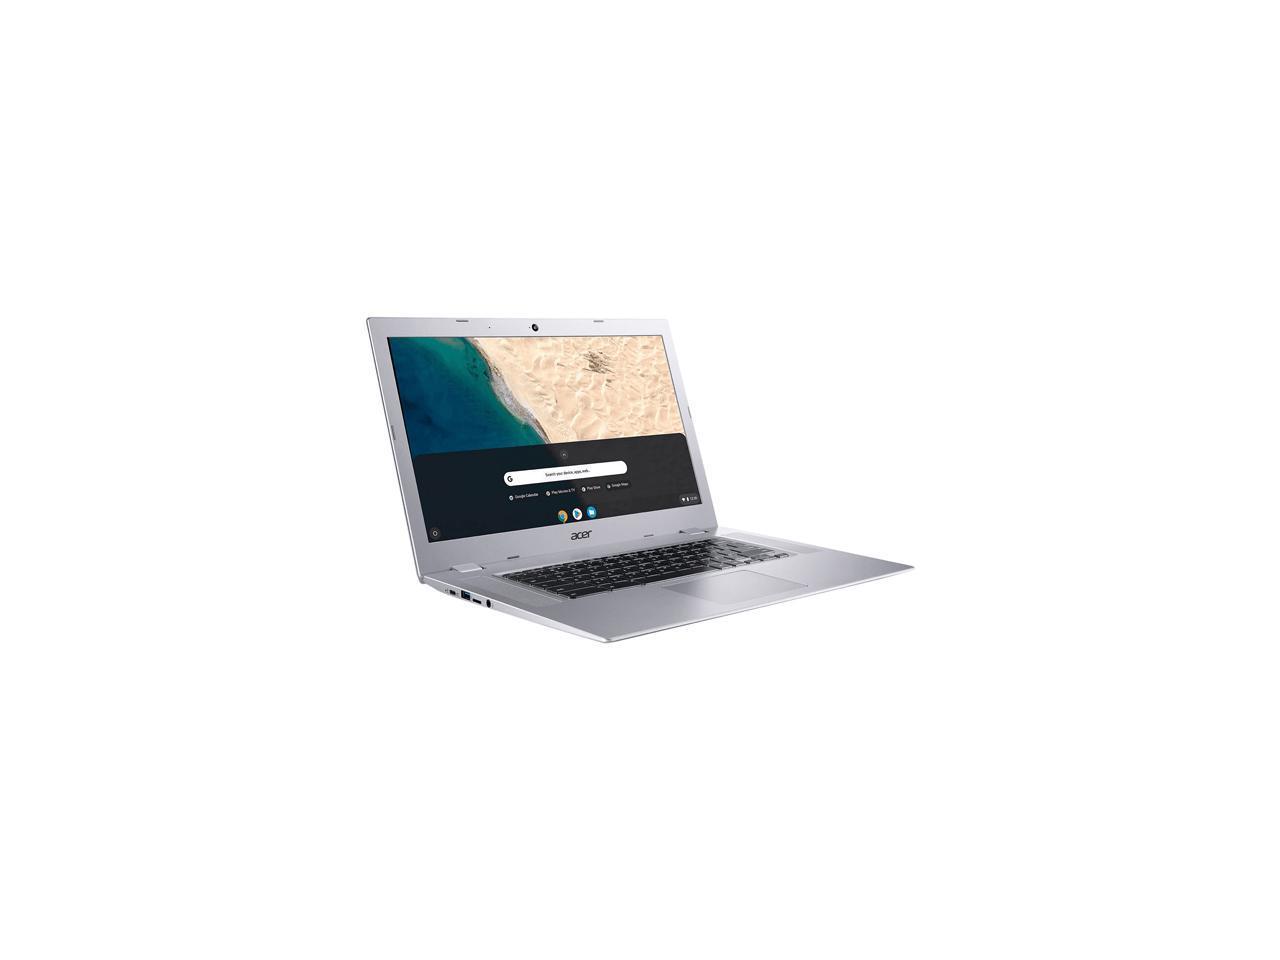 Acer Chromebook 315 Cb315 2ht 47wg Chromebook Amd A4 Series A4 9120c 1 60 Ghz Ebay